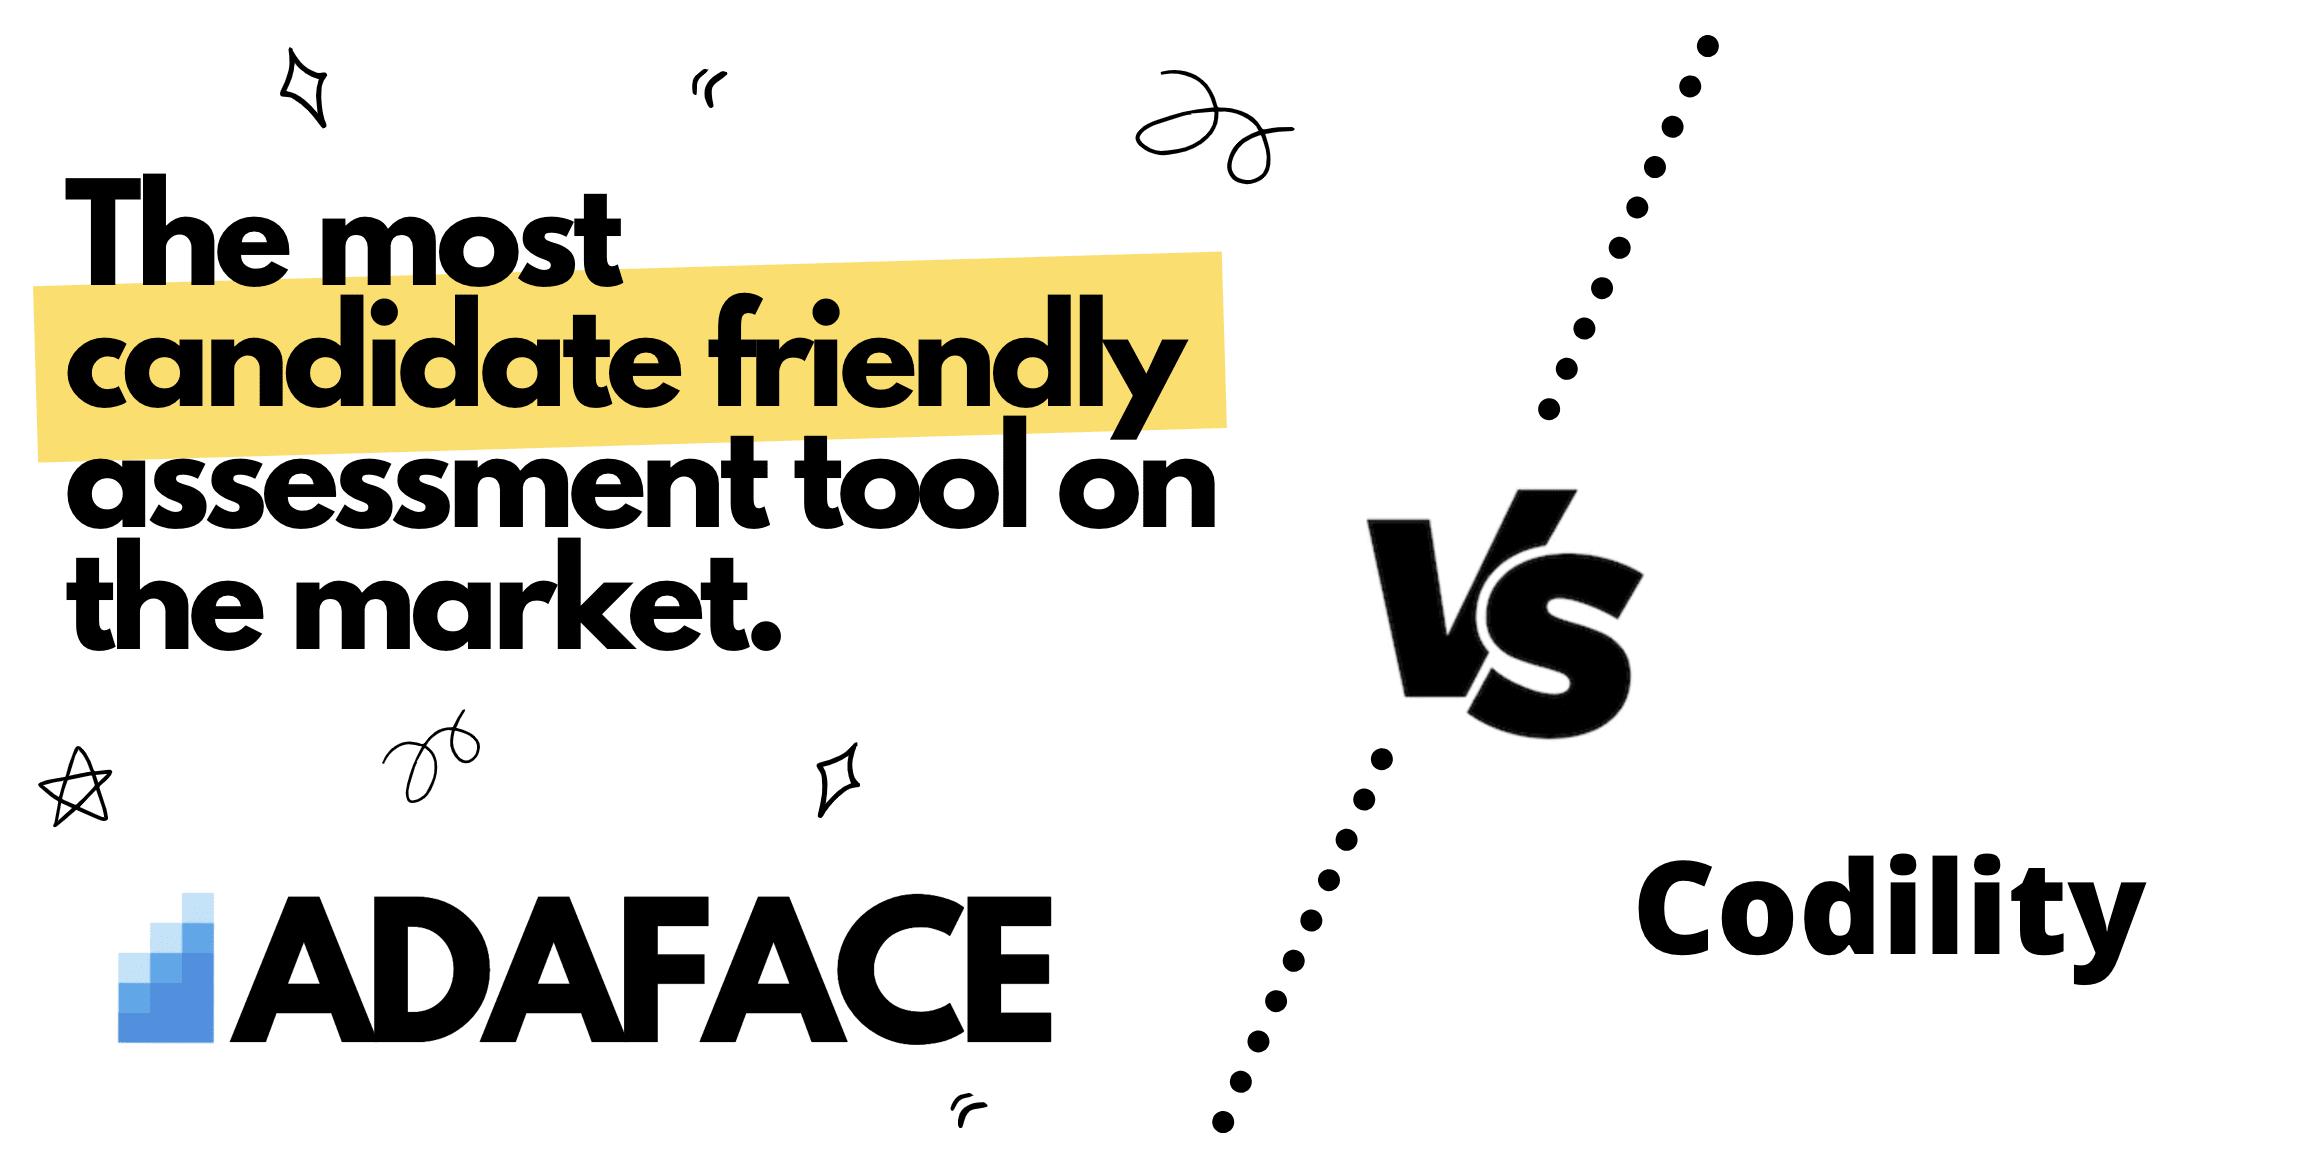 Codility vs Adaface